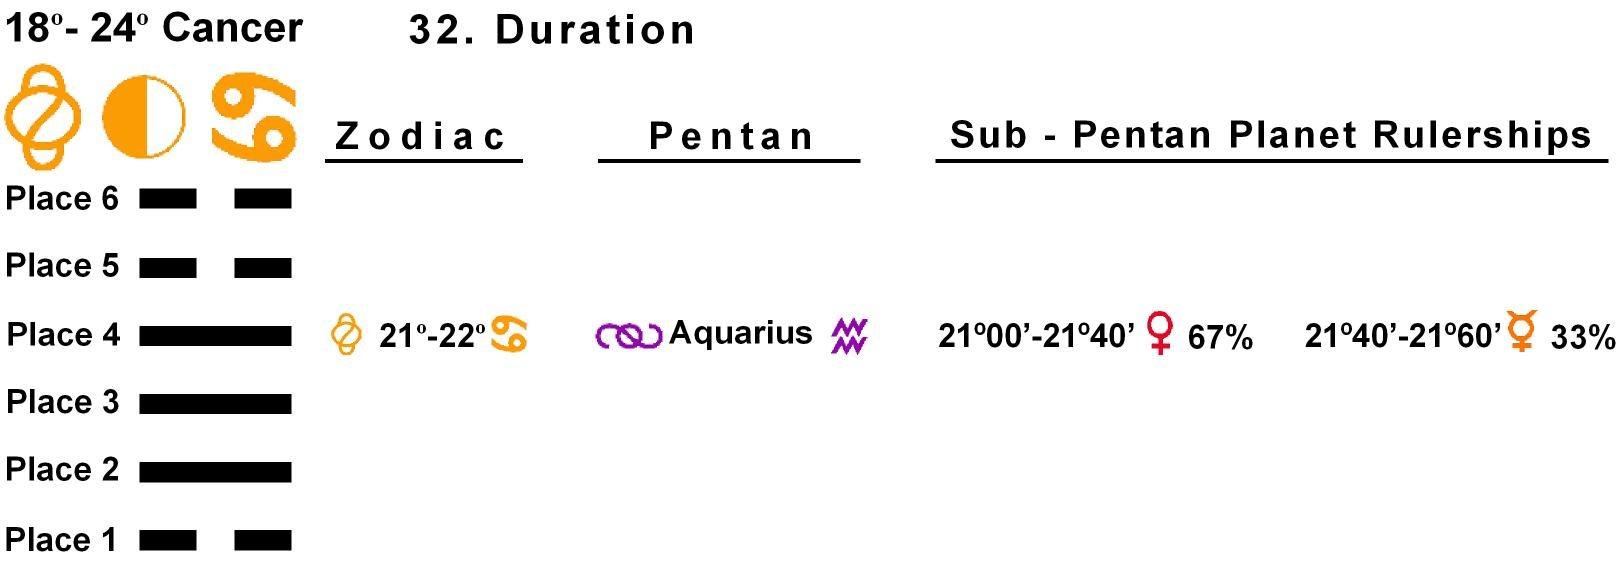 Pent-lines-04CA 21-22 Hx-32 Duration